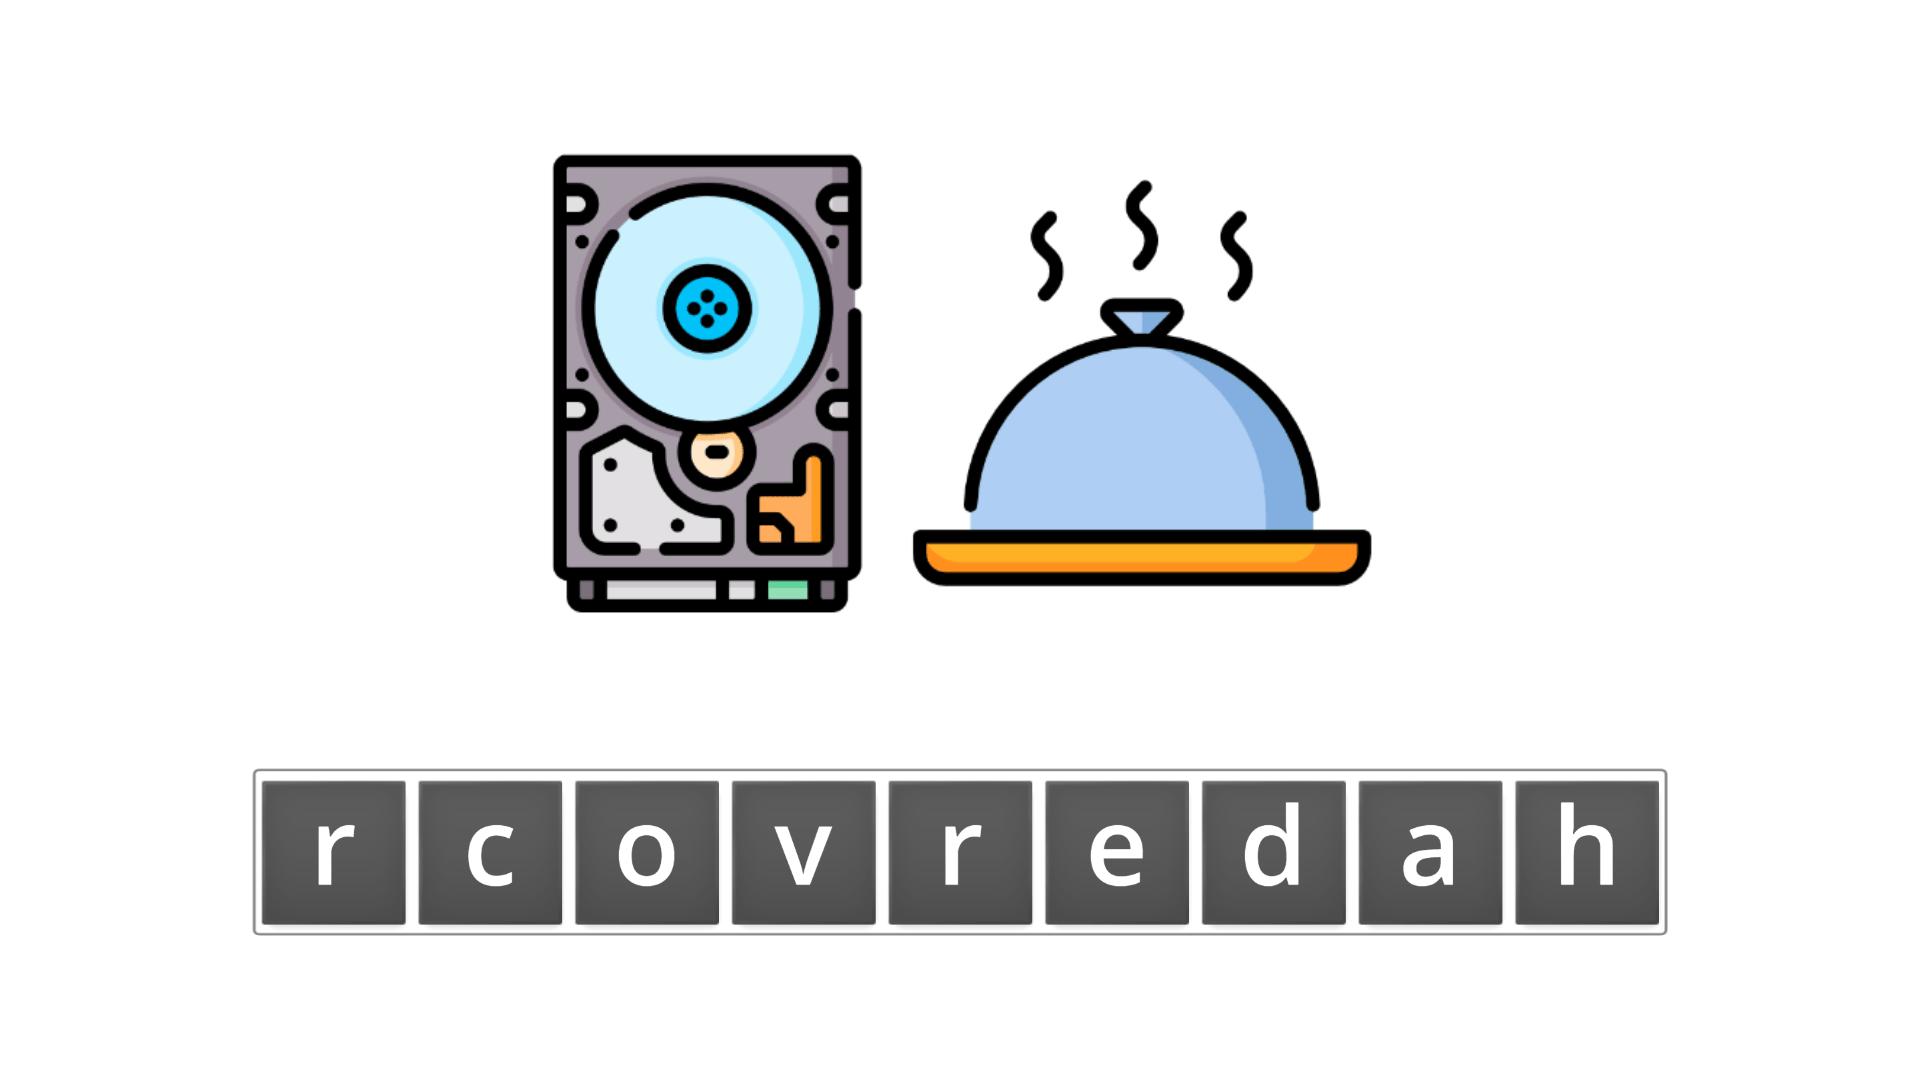 esl resources - flashcards - compound nouns - unscramble - hardcover